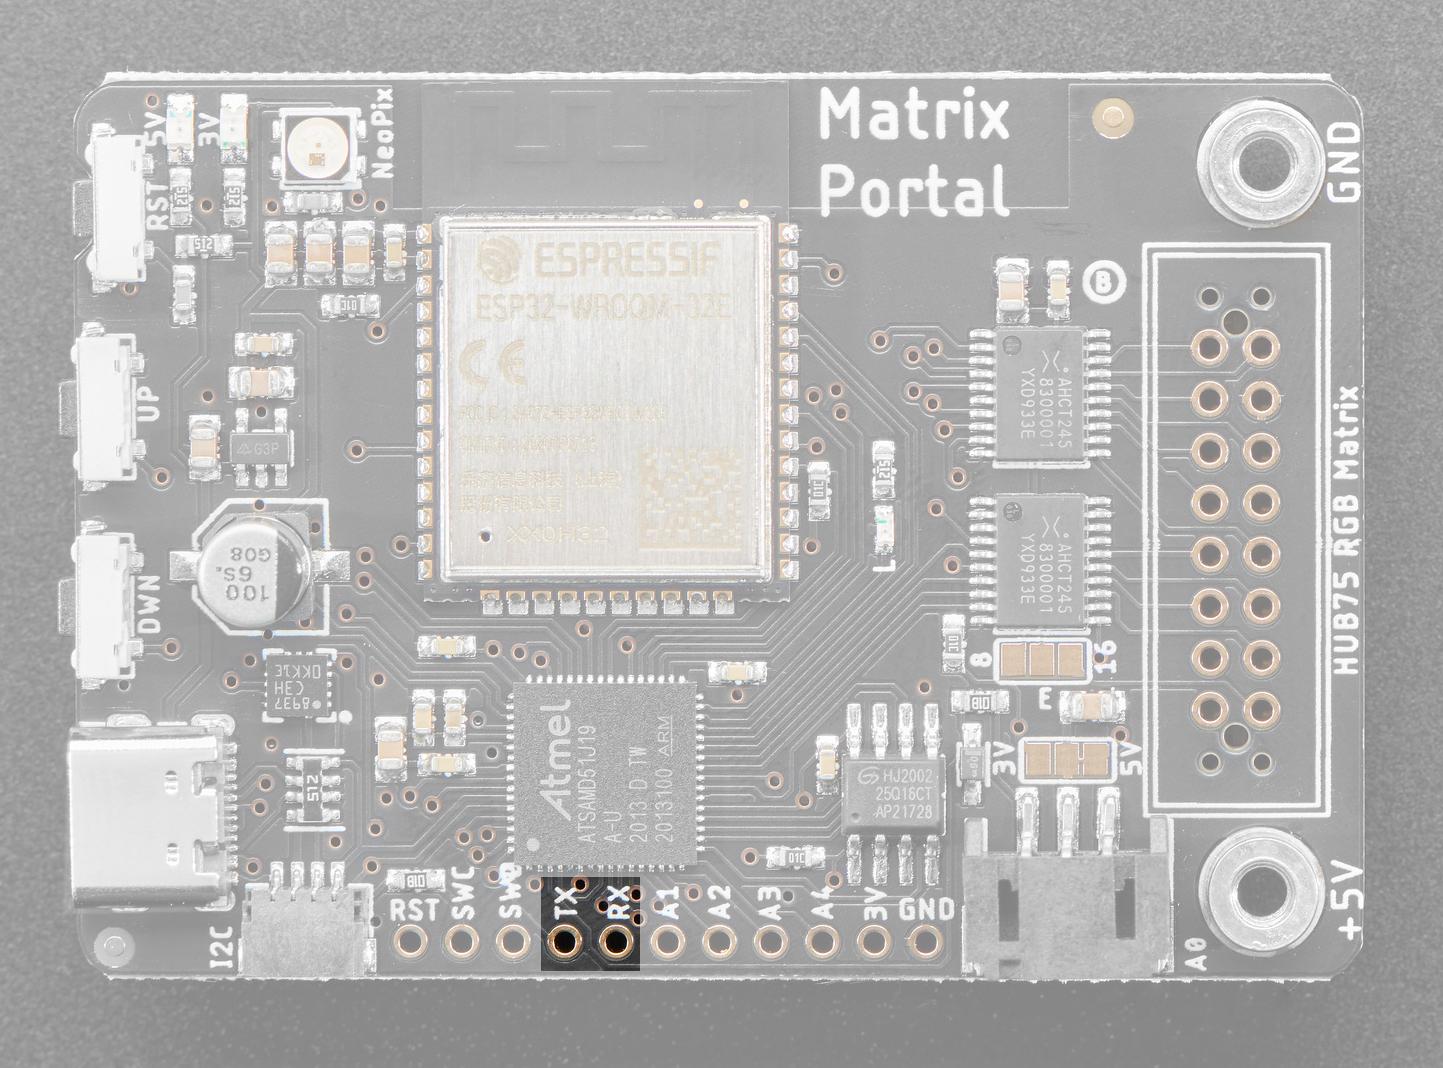 led_matrices_matrixportal_pinout_serial.jpg